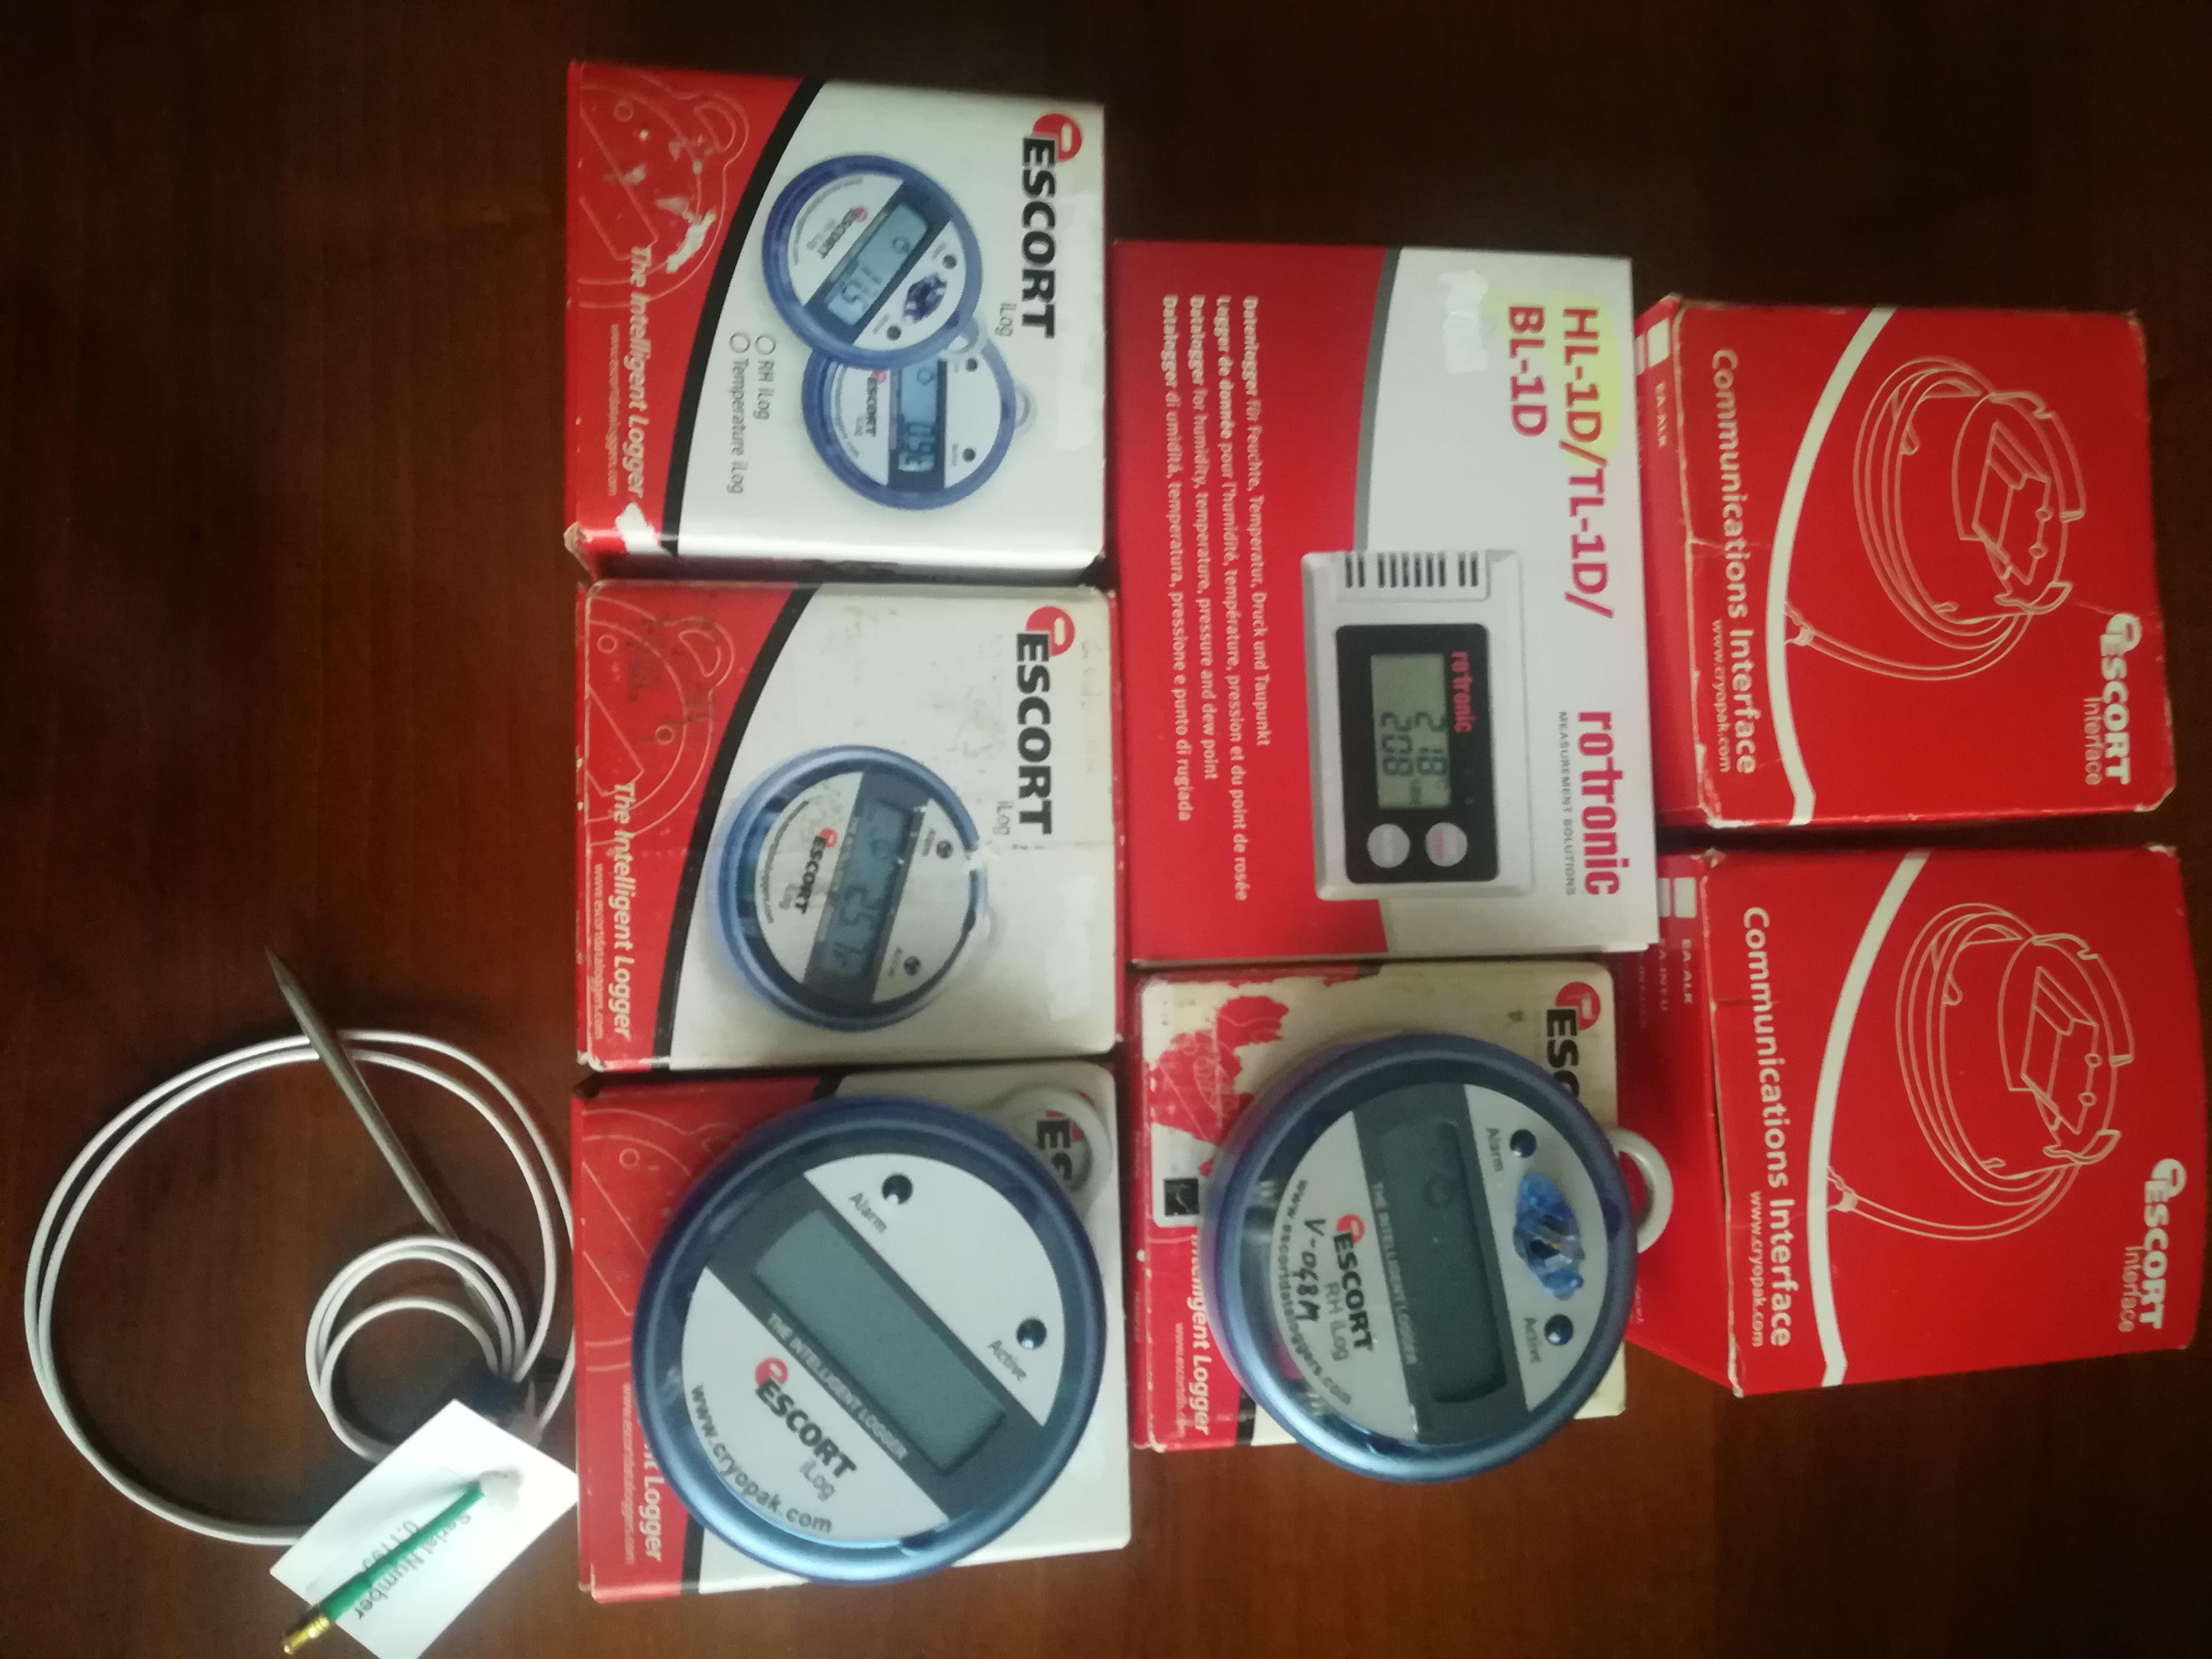 N.2 interfaccie Escort usb + N. 5 data logger  in vendita - foto 1